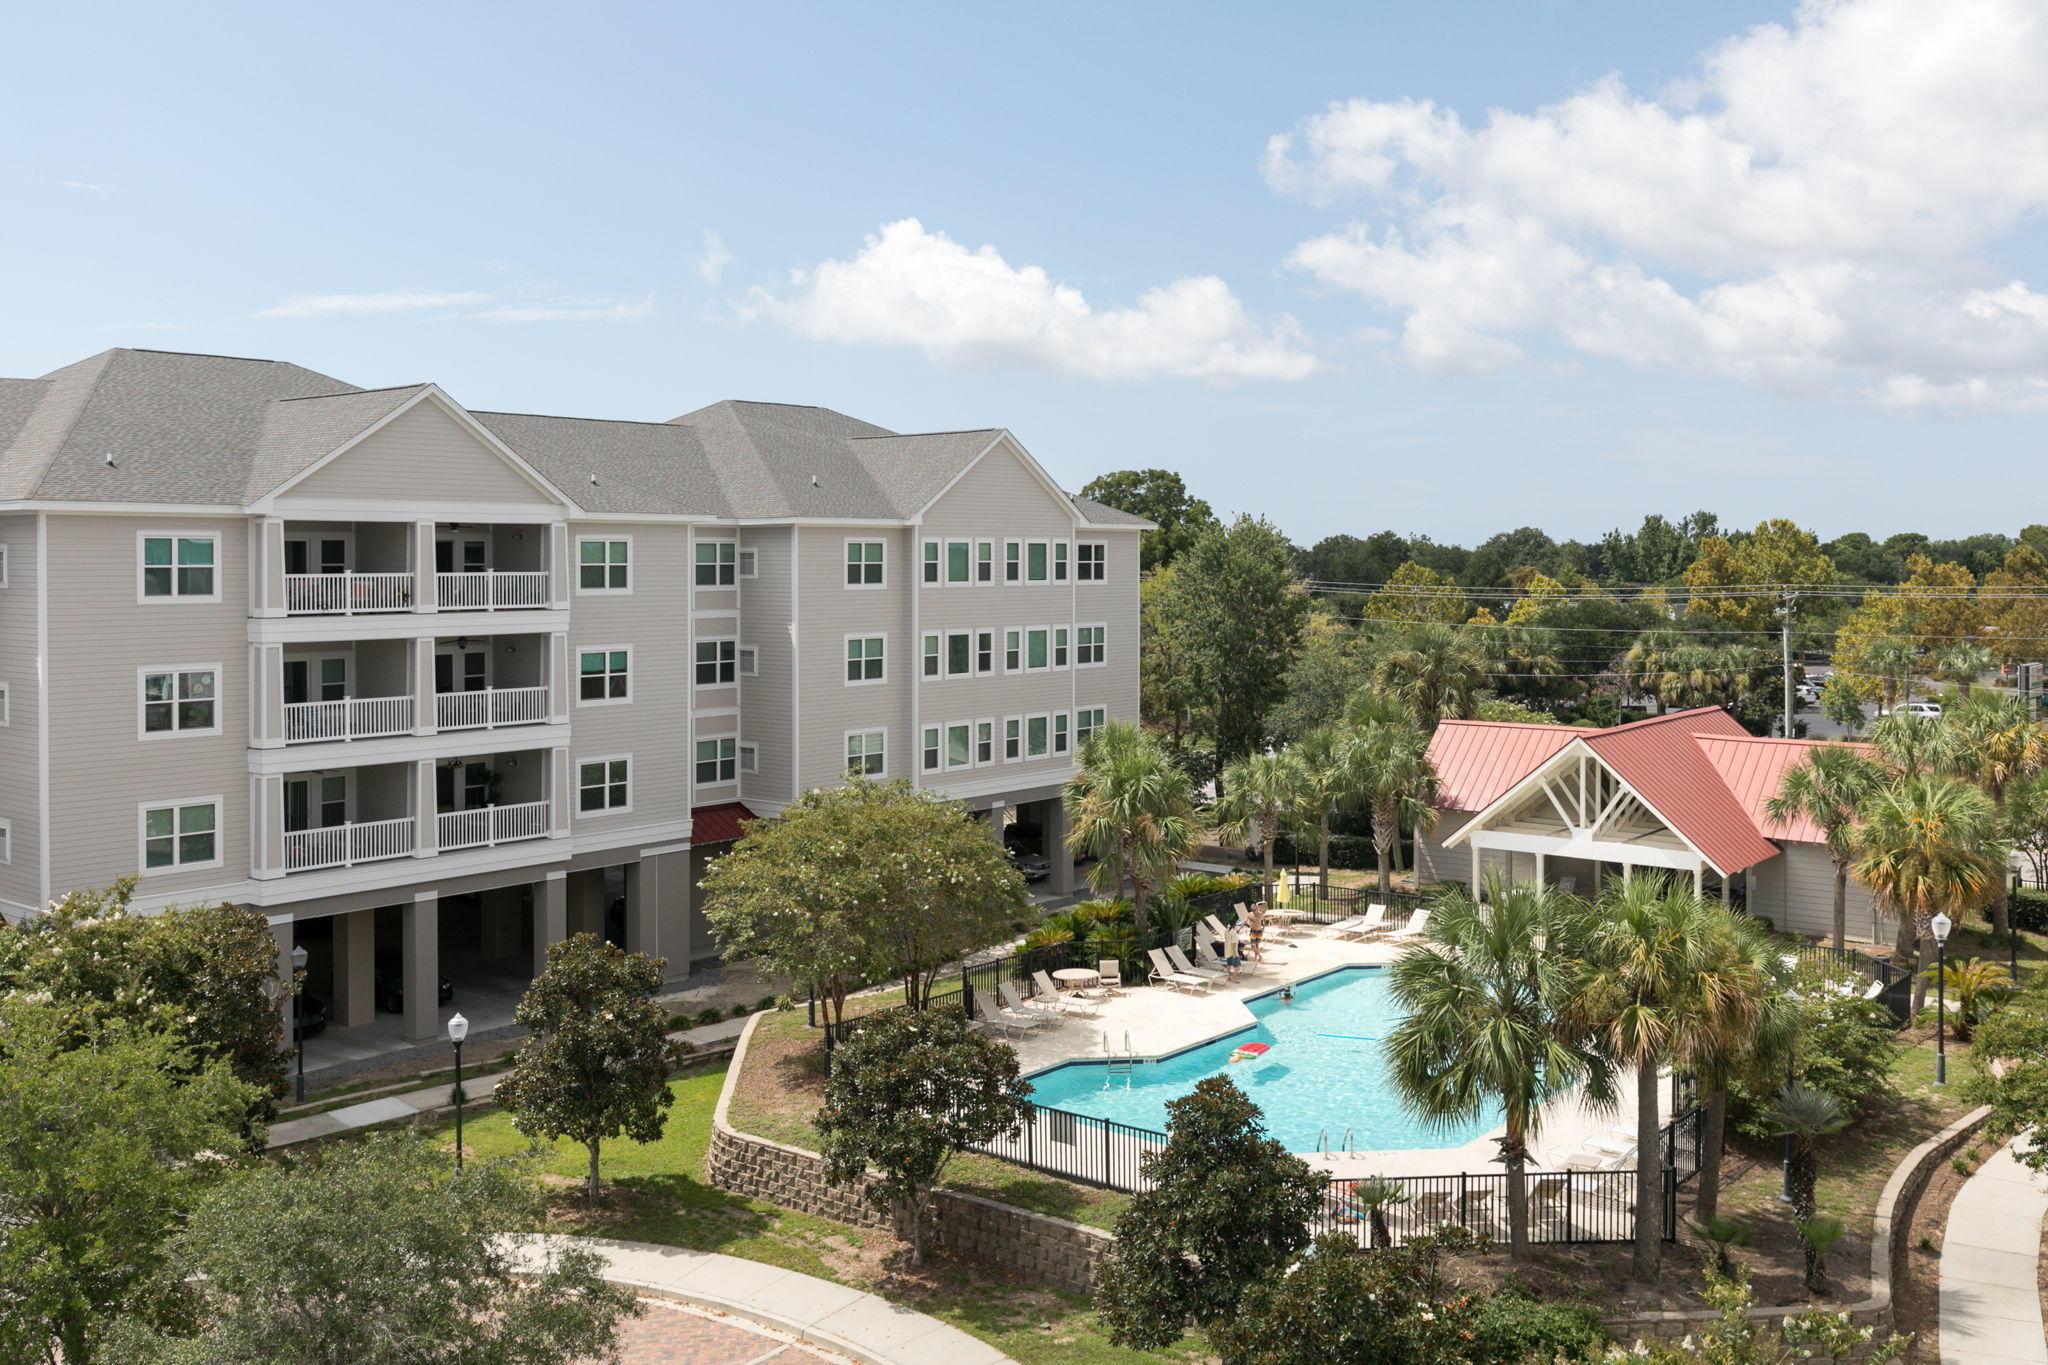 Pelican Pointe Villas Homes For Sale - 1984 Folly, Charleston, SC - 1